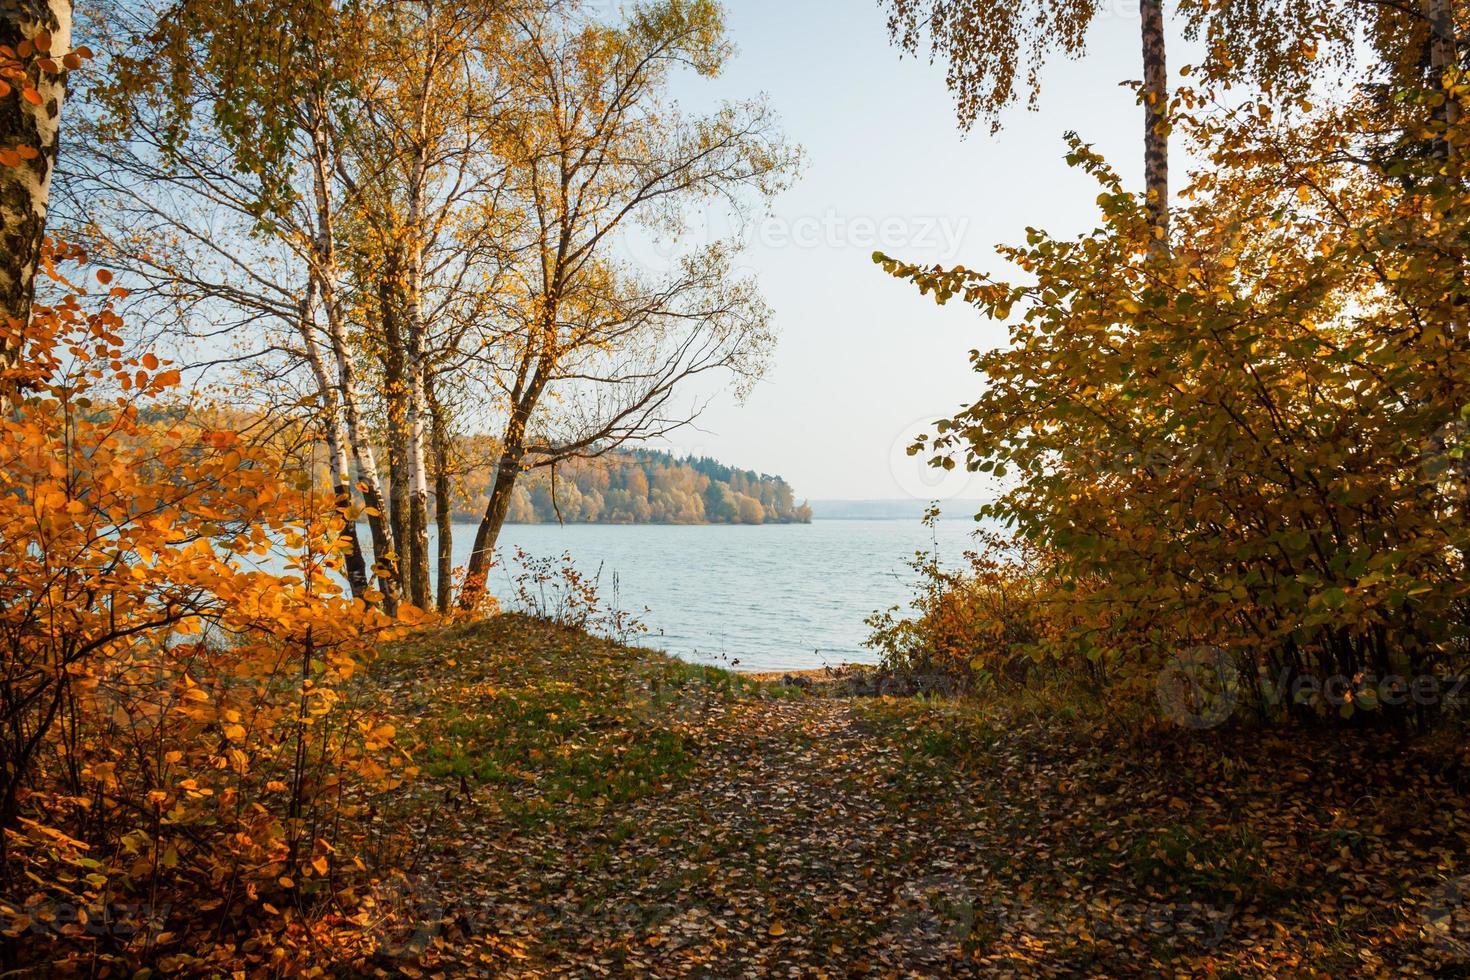 automne russe photo